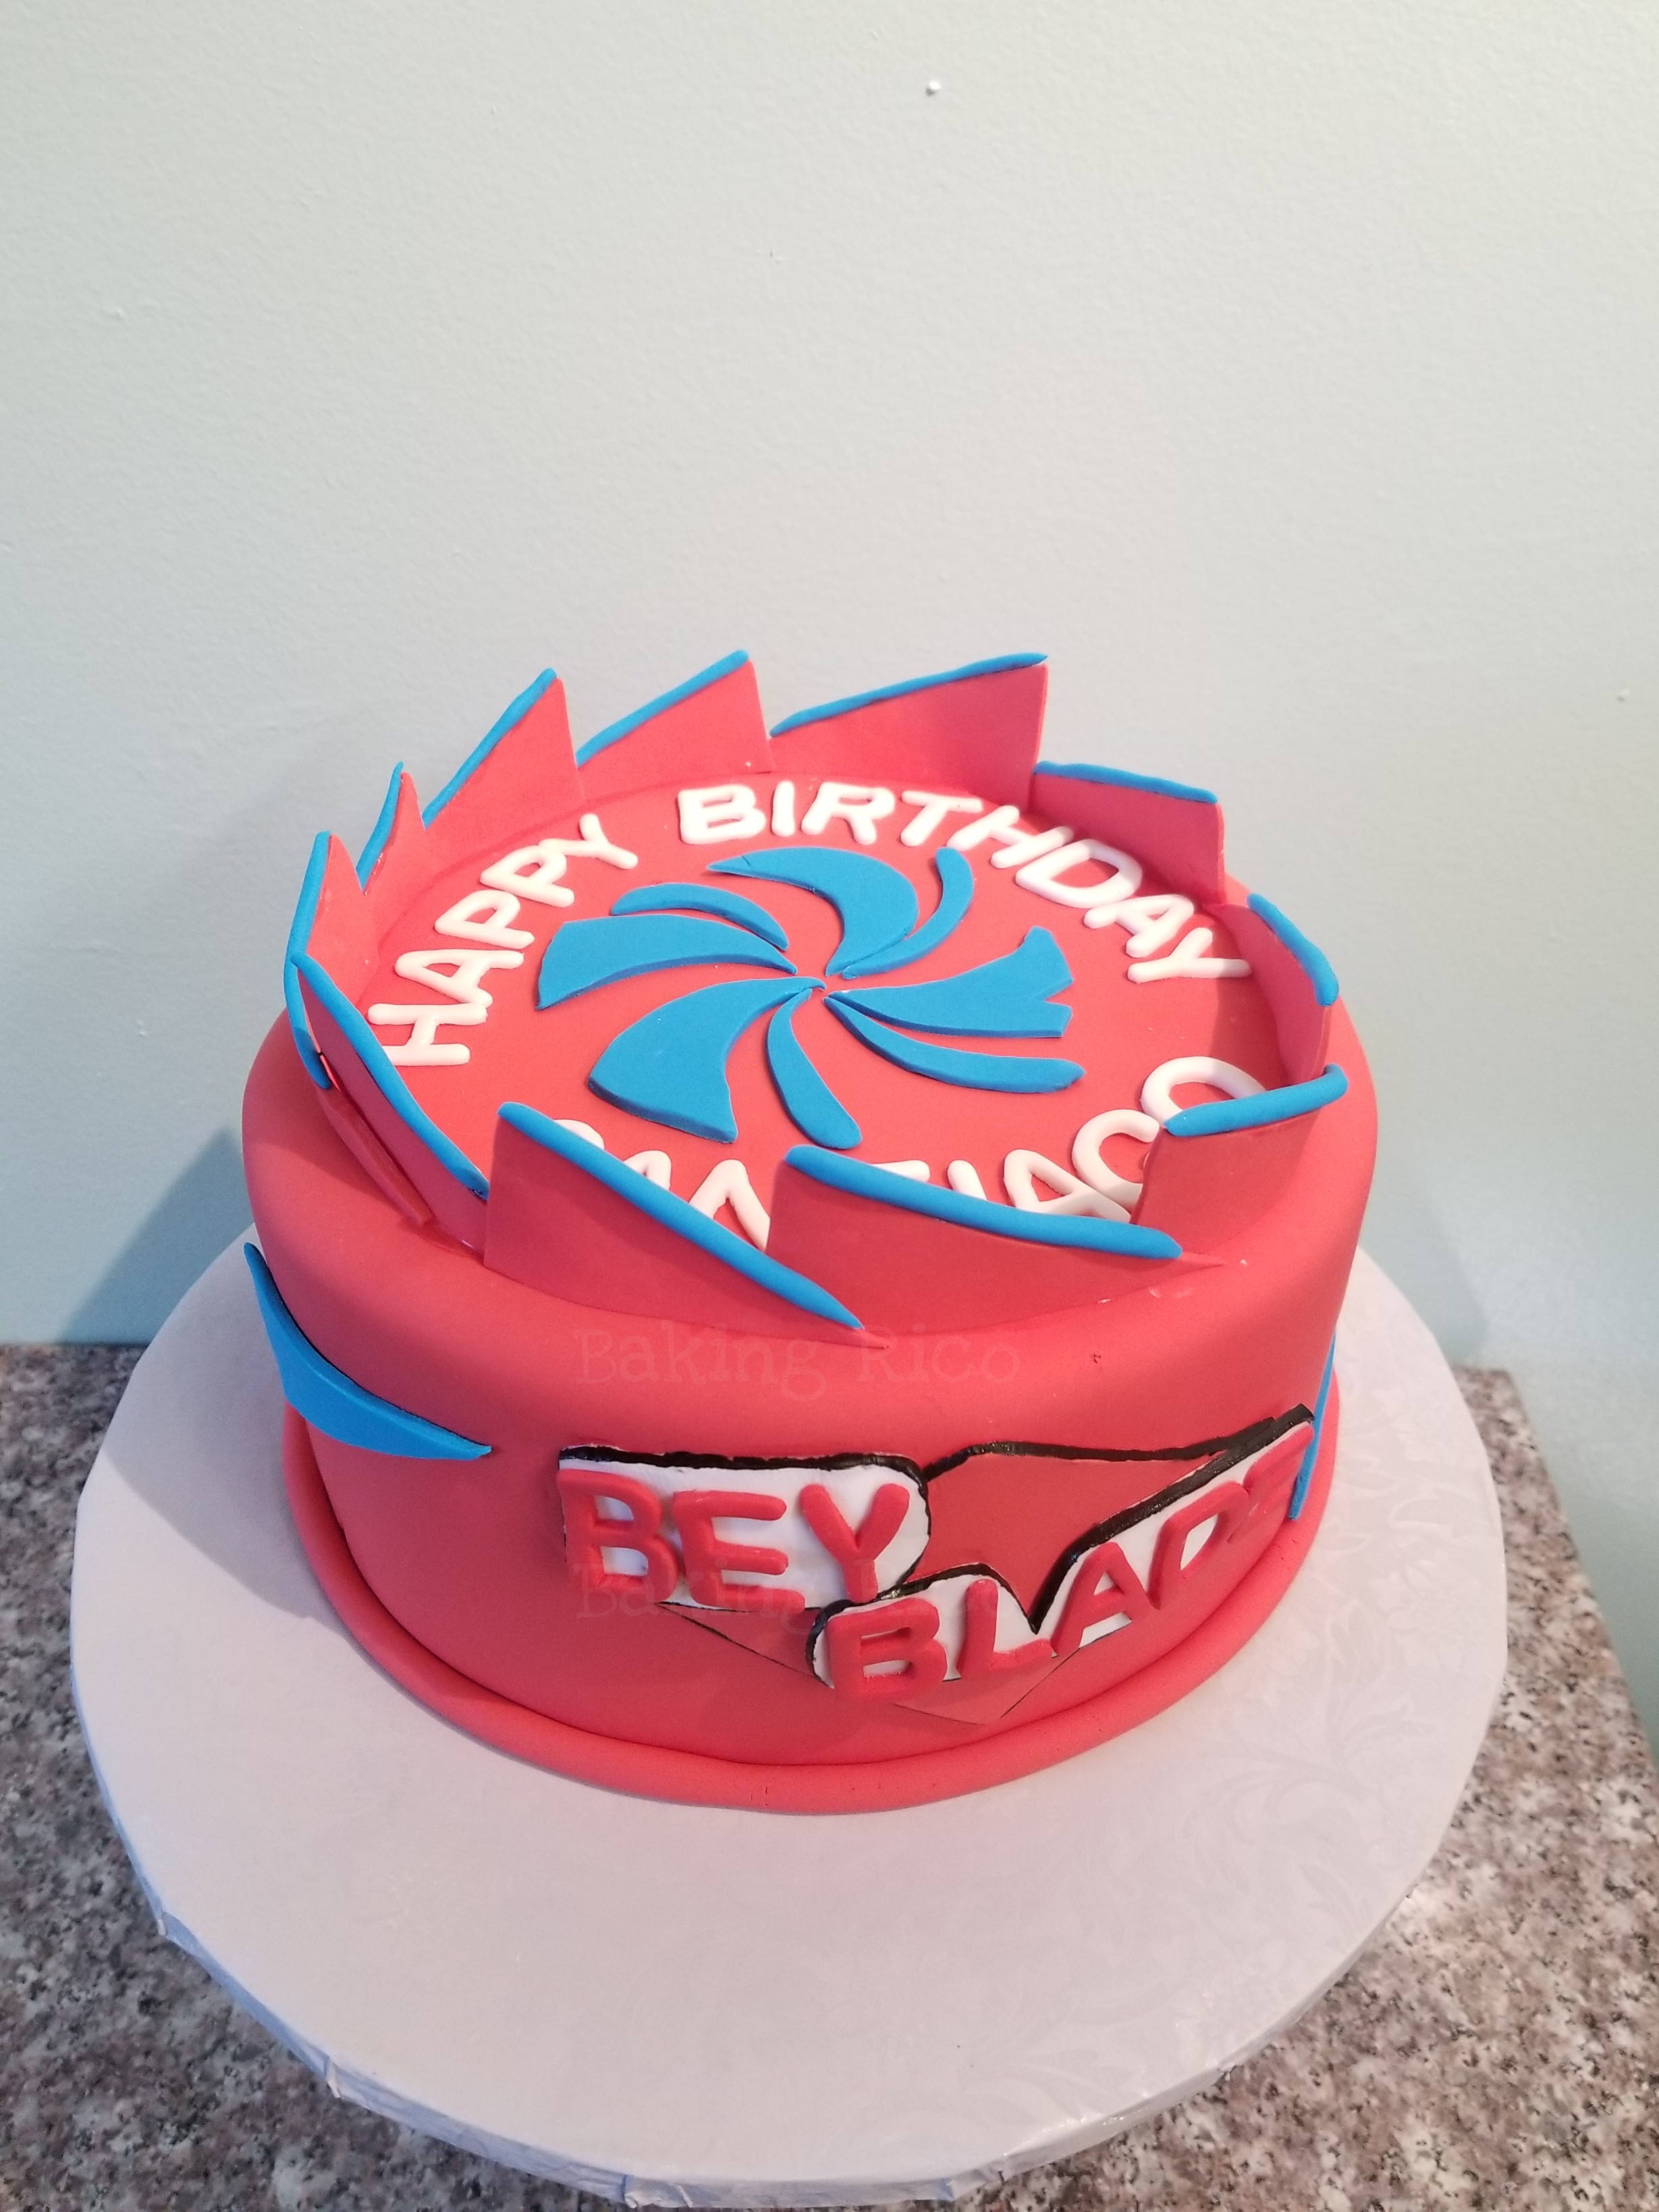 Bey Blade Birthday Cake